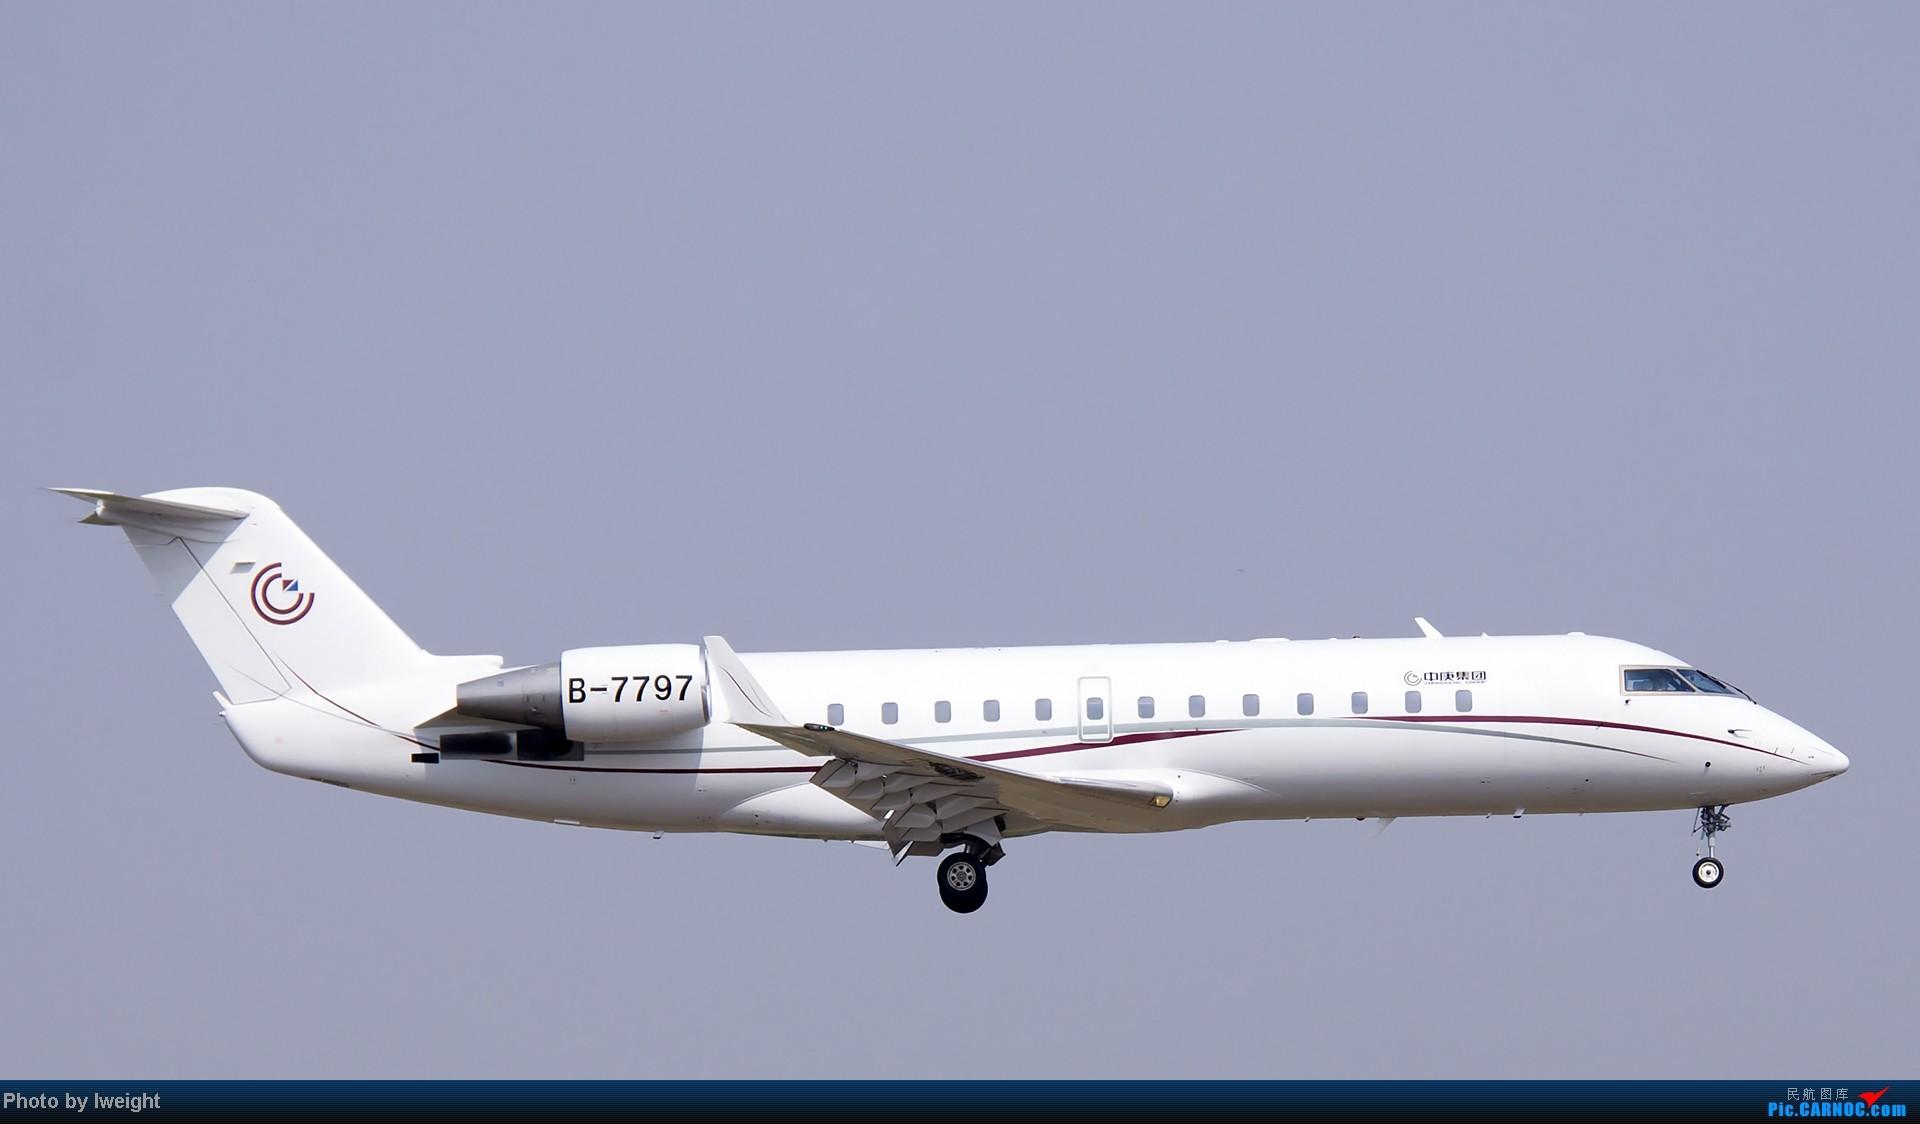 Re:[原创]错过了卡航的巴塞罗那号,只有这些大路货了,泪奔啊 CANADAIR CL-600-2B19 CHALLENGER 850 B-7797 中国北京首都机场